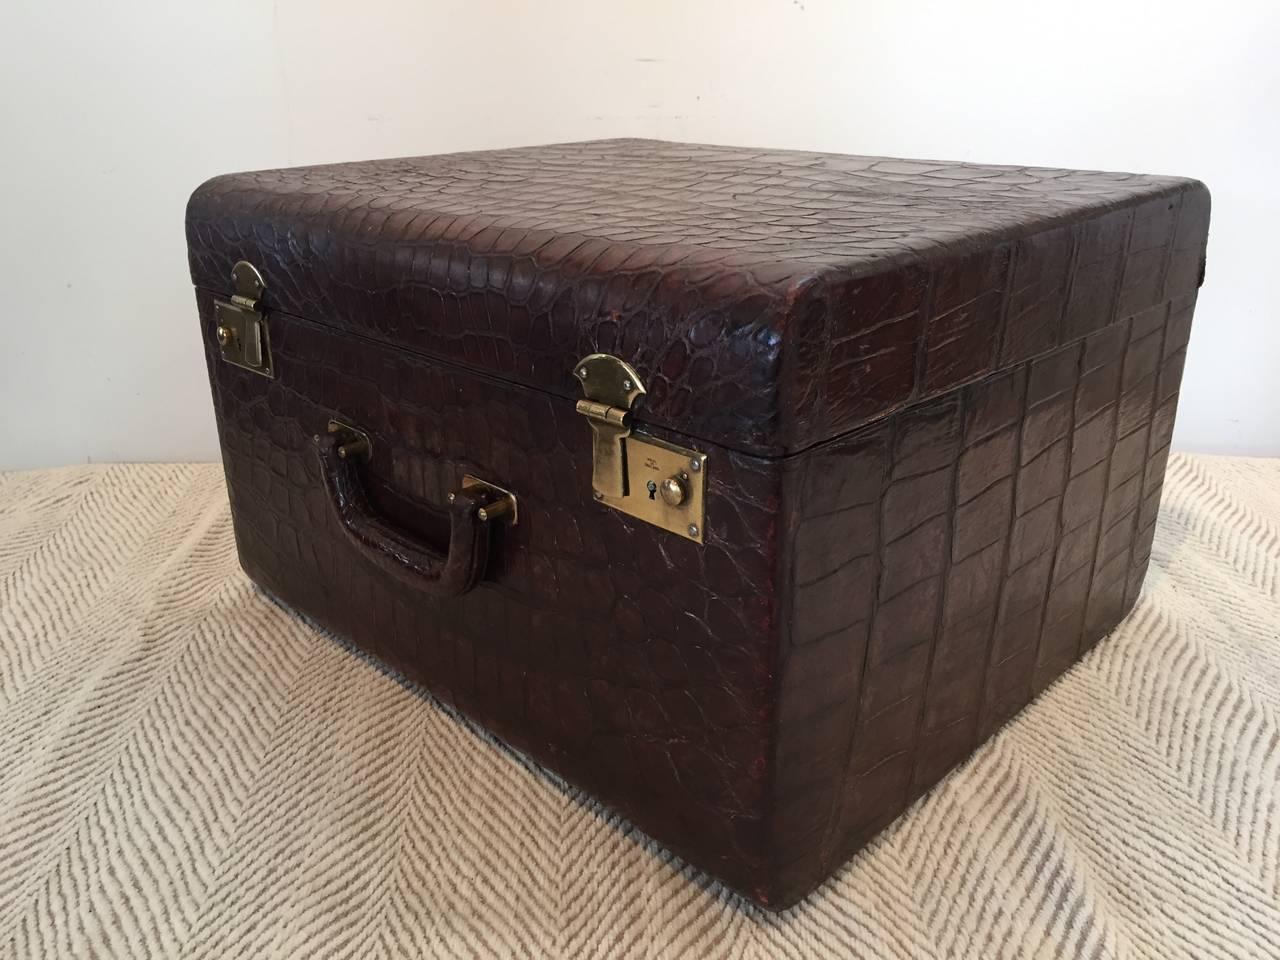 English brown alligator brass lock hardware large travel trunk, with all original lining.